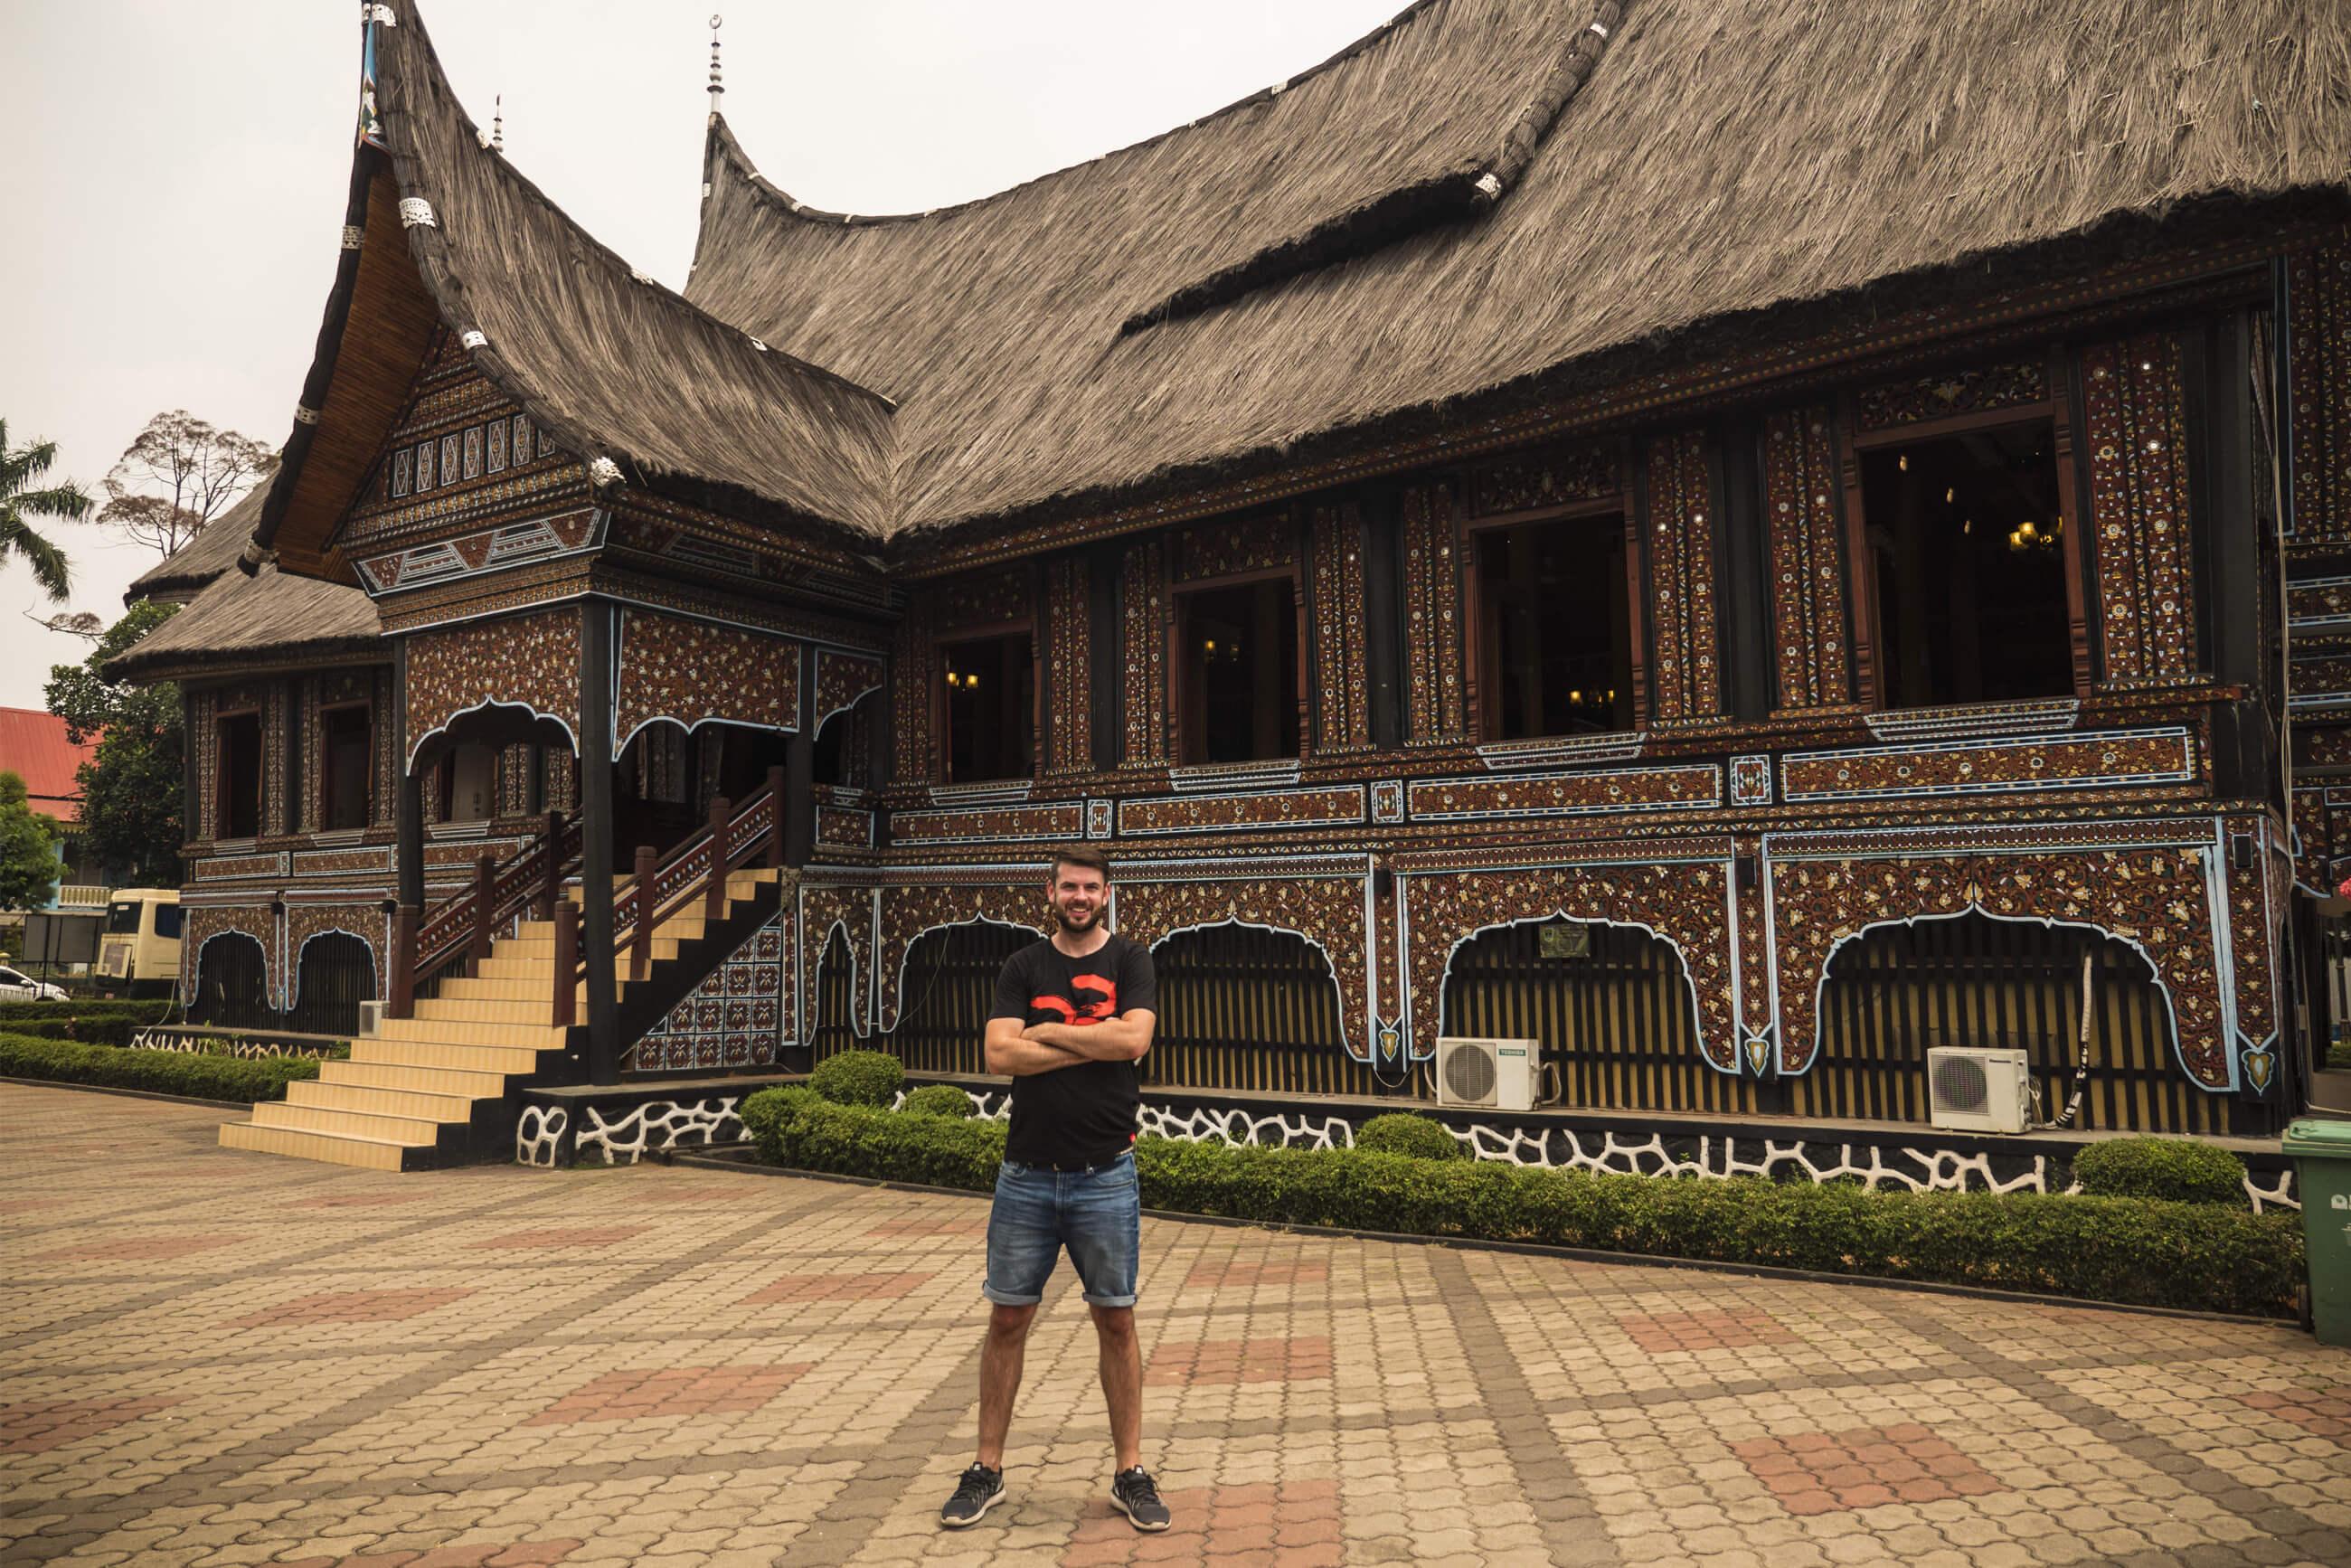 https://bubo.sk/uploads/galleries/4921/martin_simko_indonezia_java.jpg